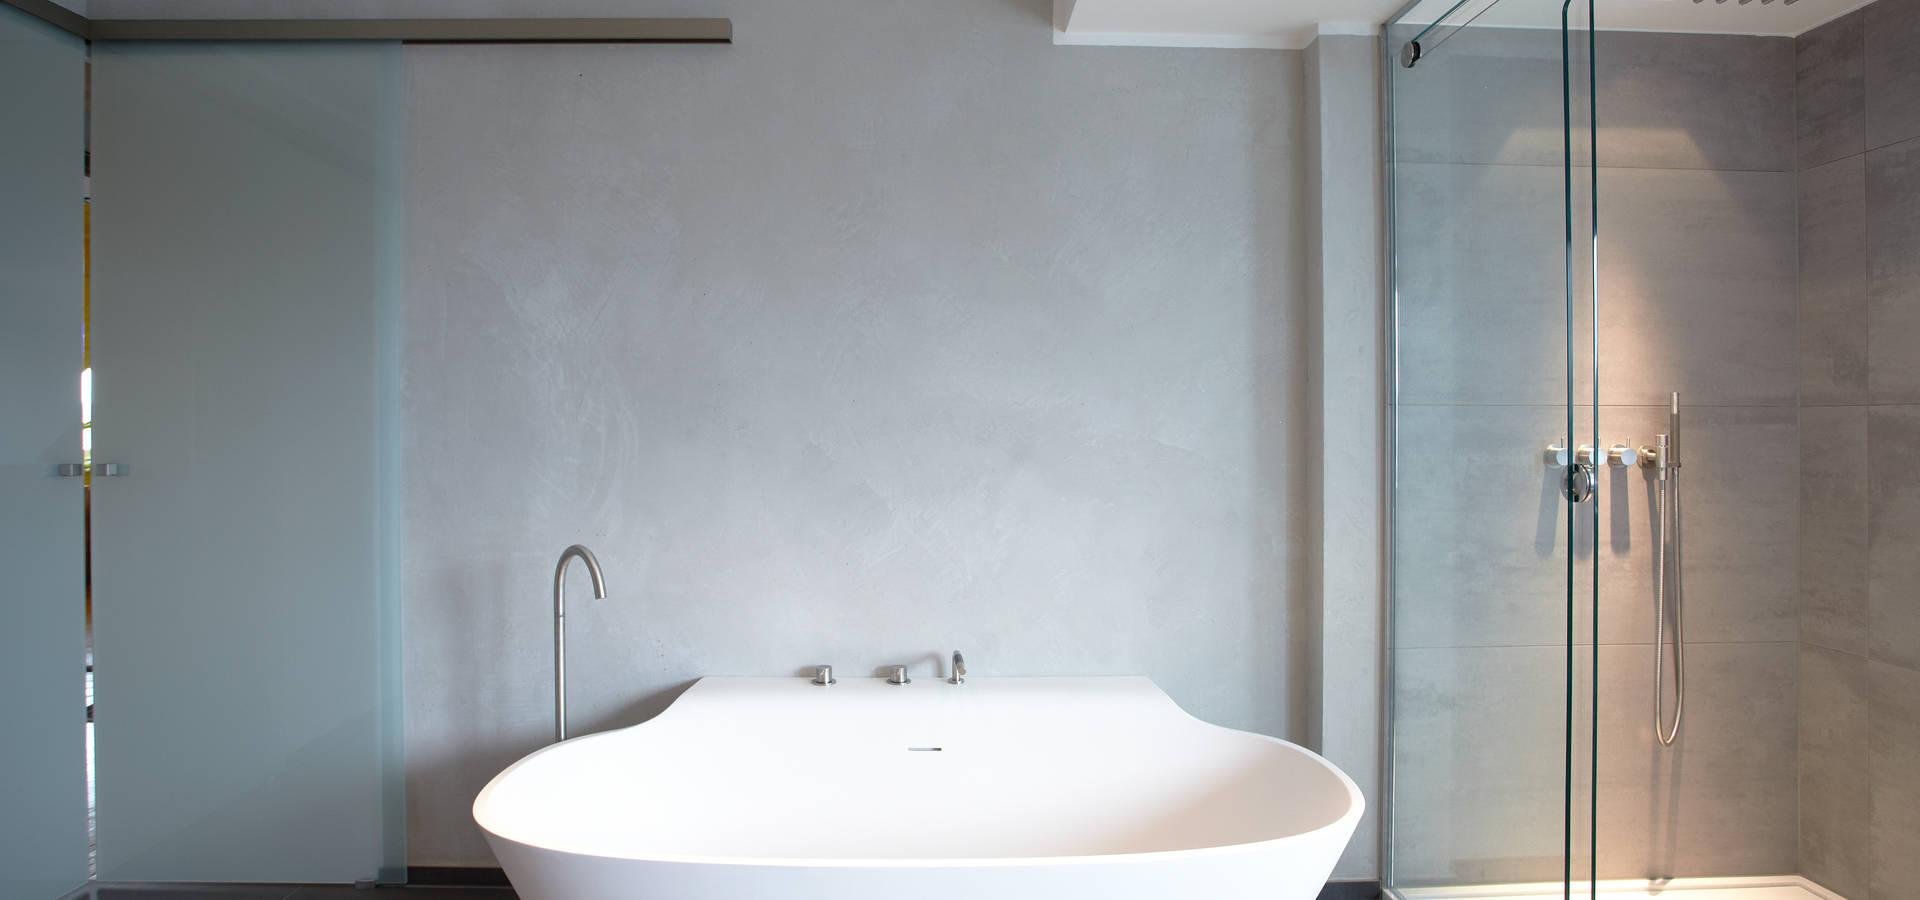 designer bad bochum di raumgesp r innenarchitektur design. Black Bedroom Furniture Sets. Home Design Ideas